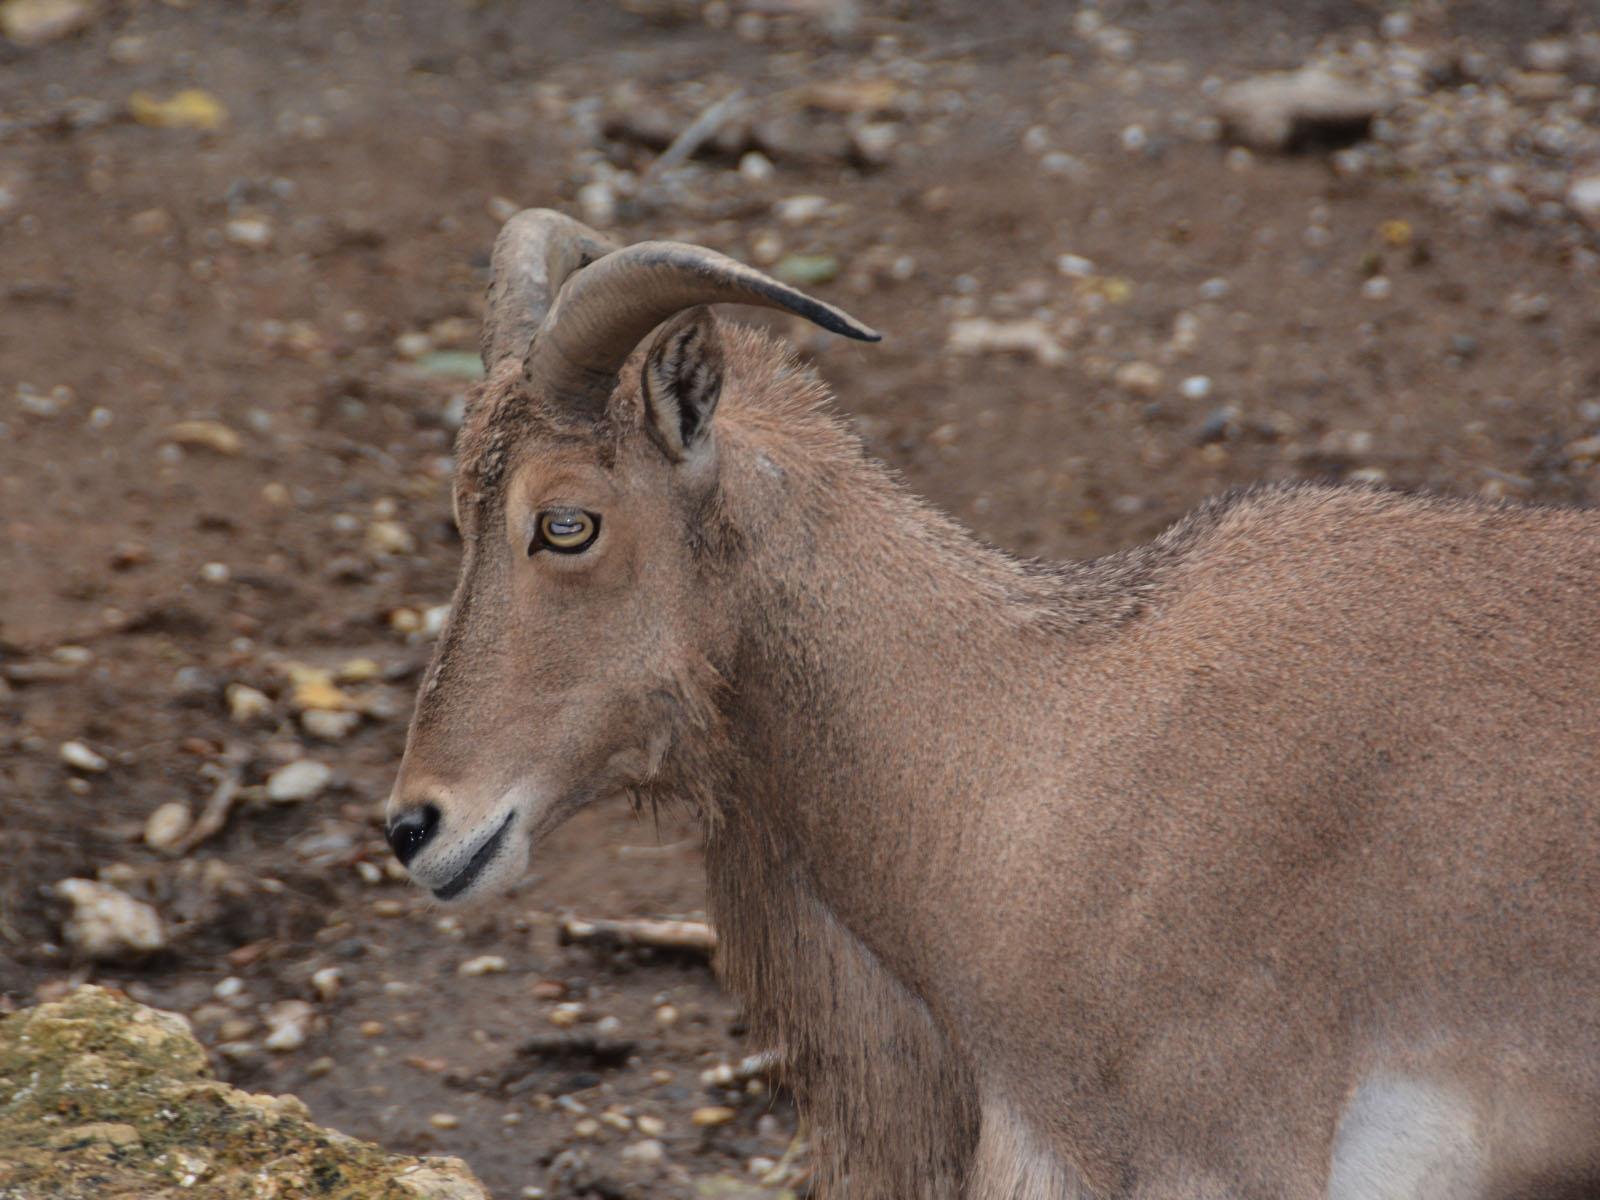 The Online Zoo - Frank Buck Zoo